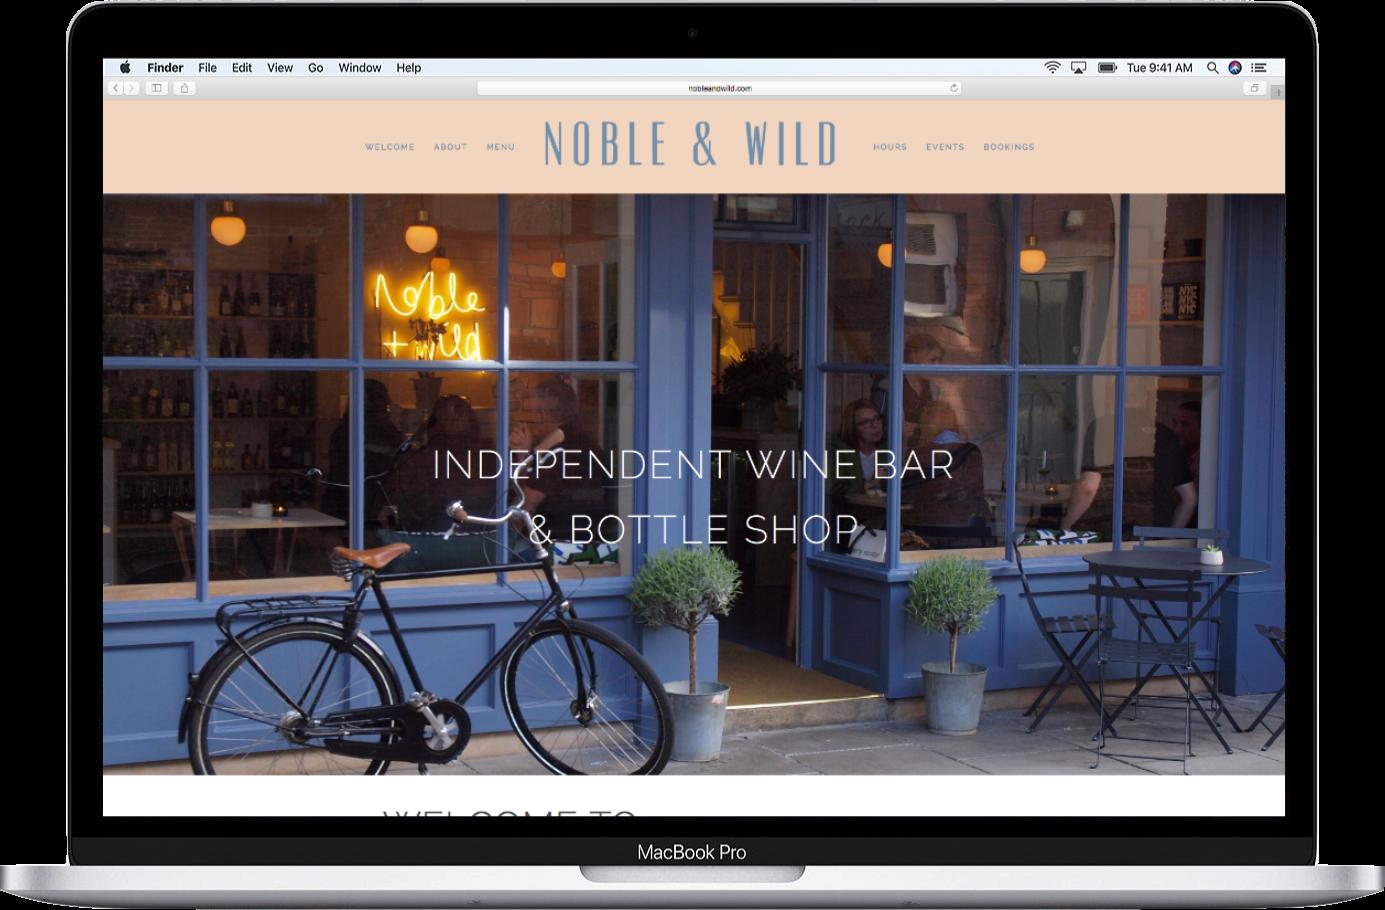 Noble & Wild website